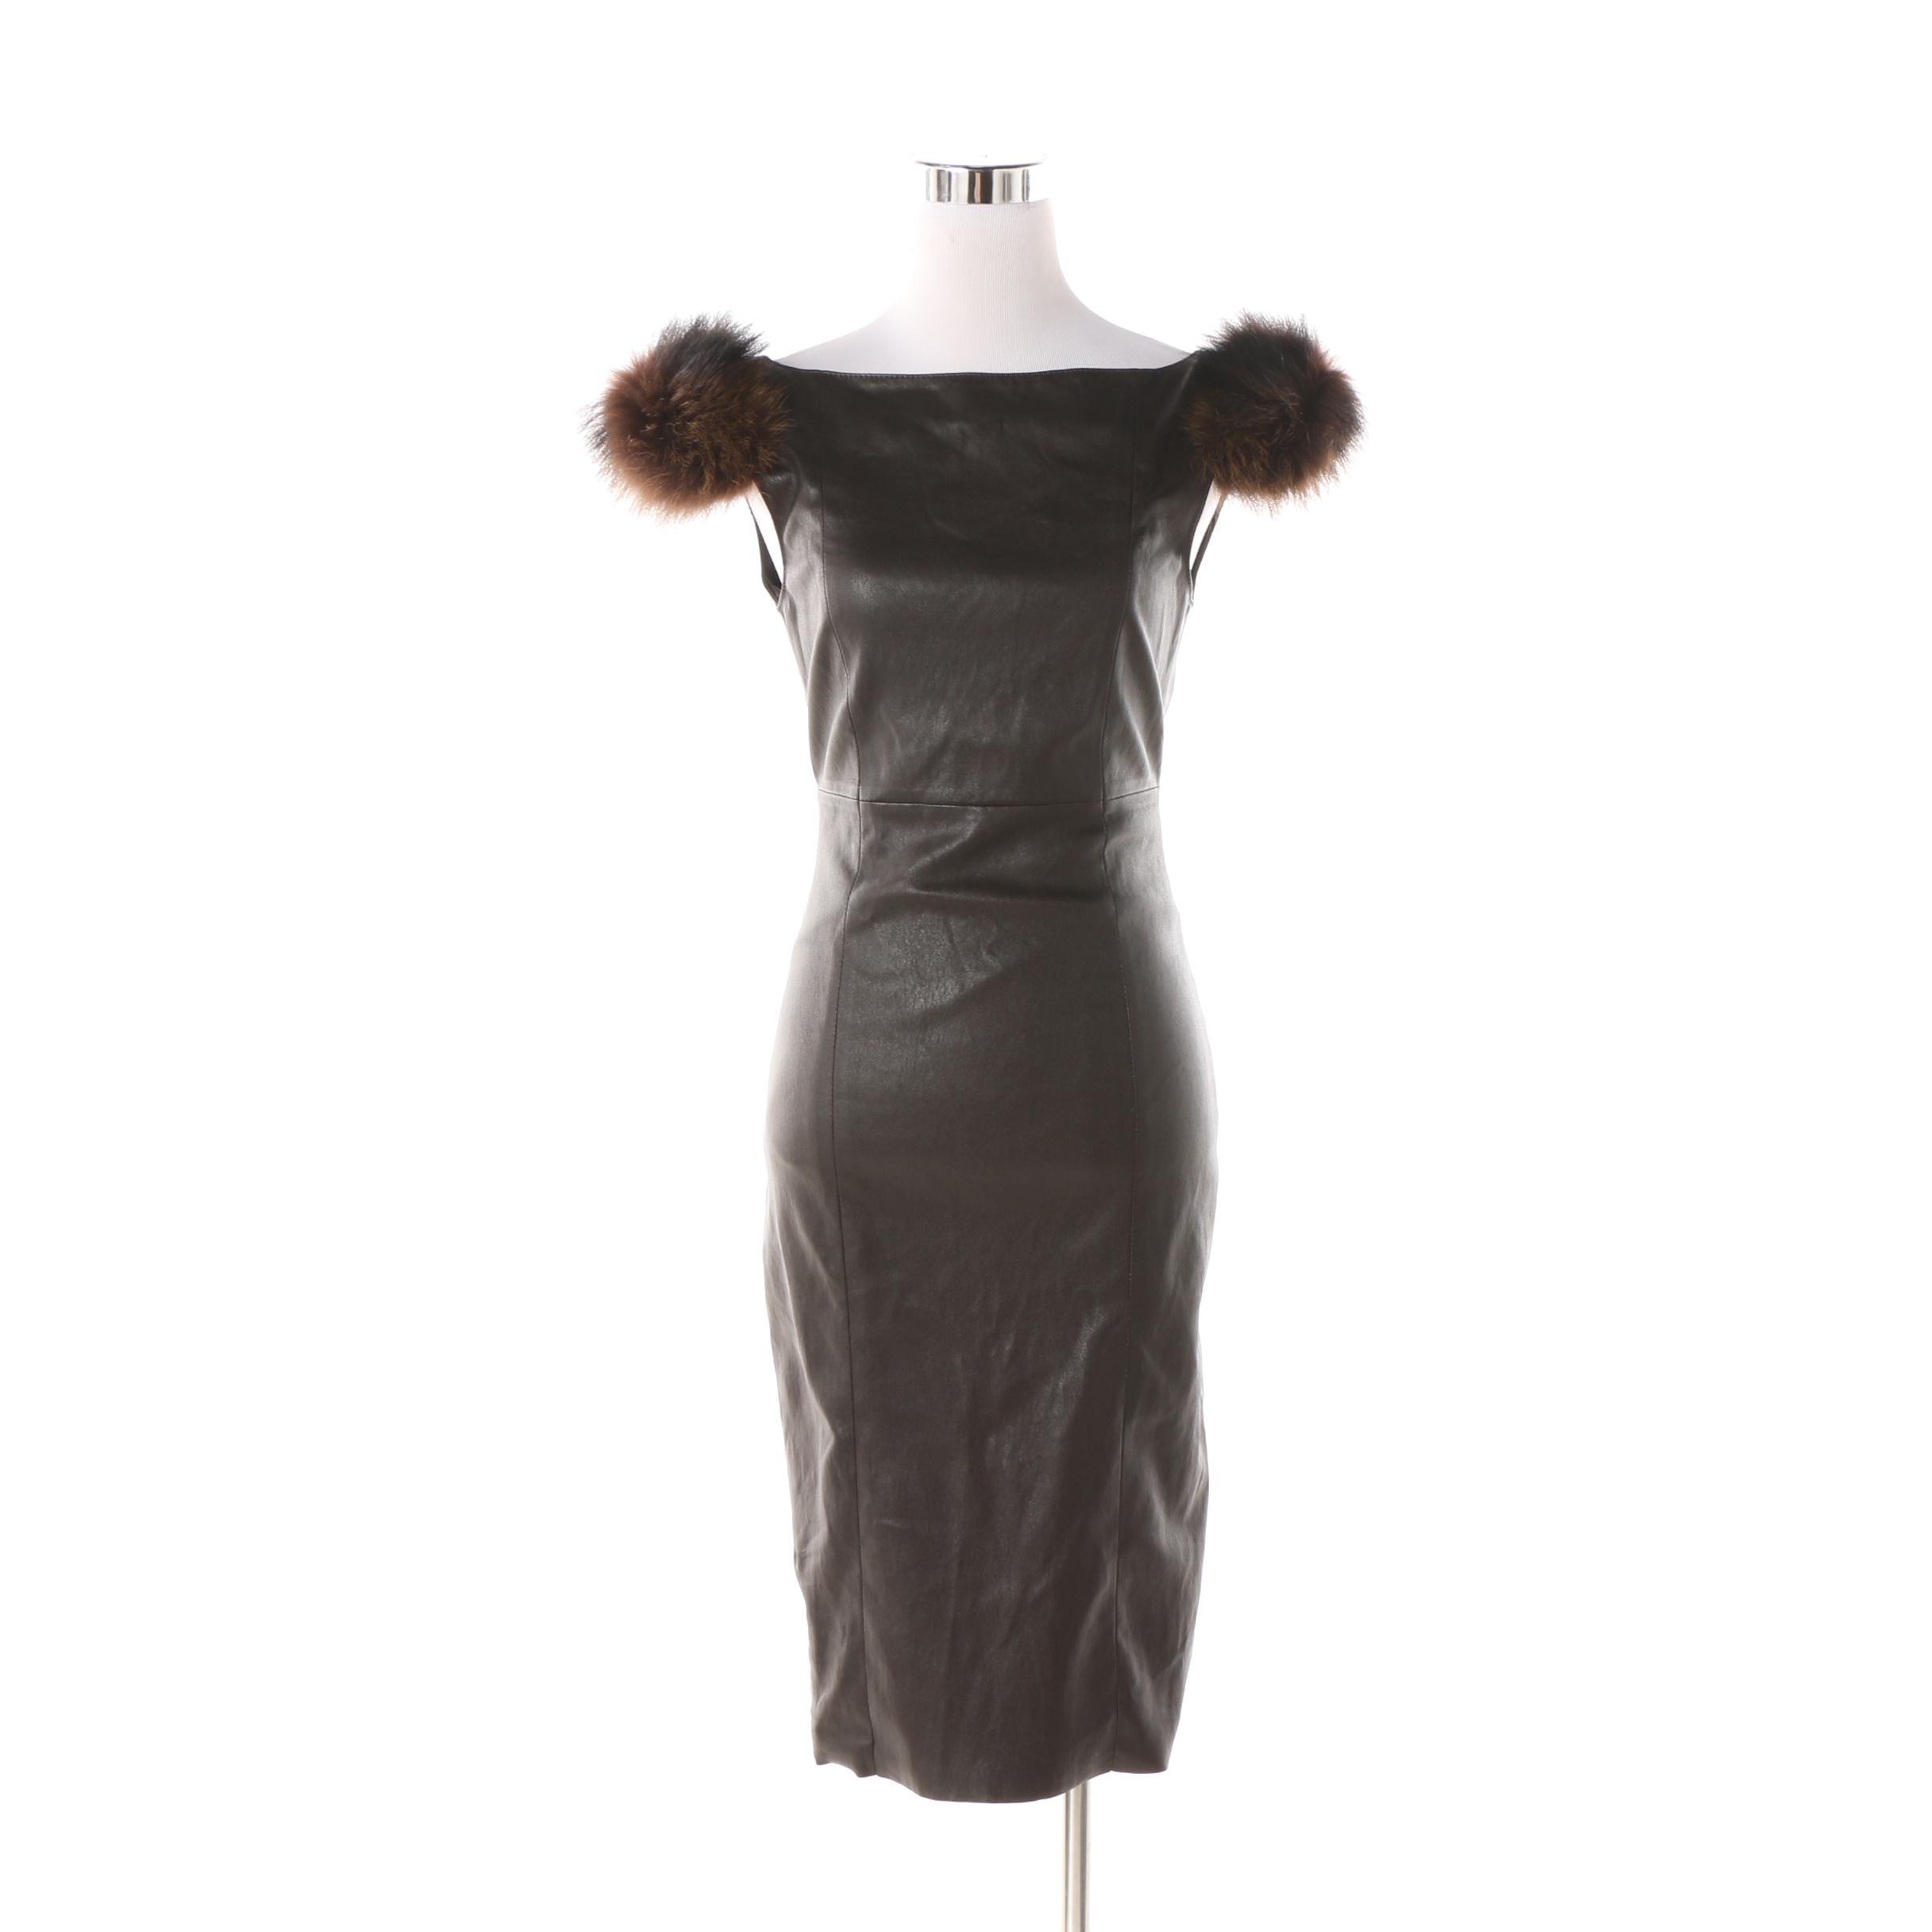 Thomas Wylde Brown Leather Raccoon Fur Trimmed Dress